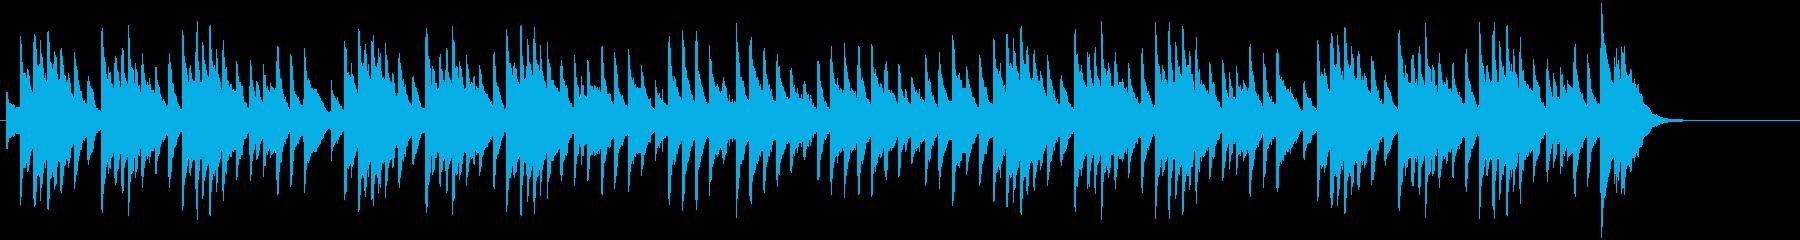 CMで有名クリスマスソングのオルゴール風の再生済みの波形